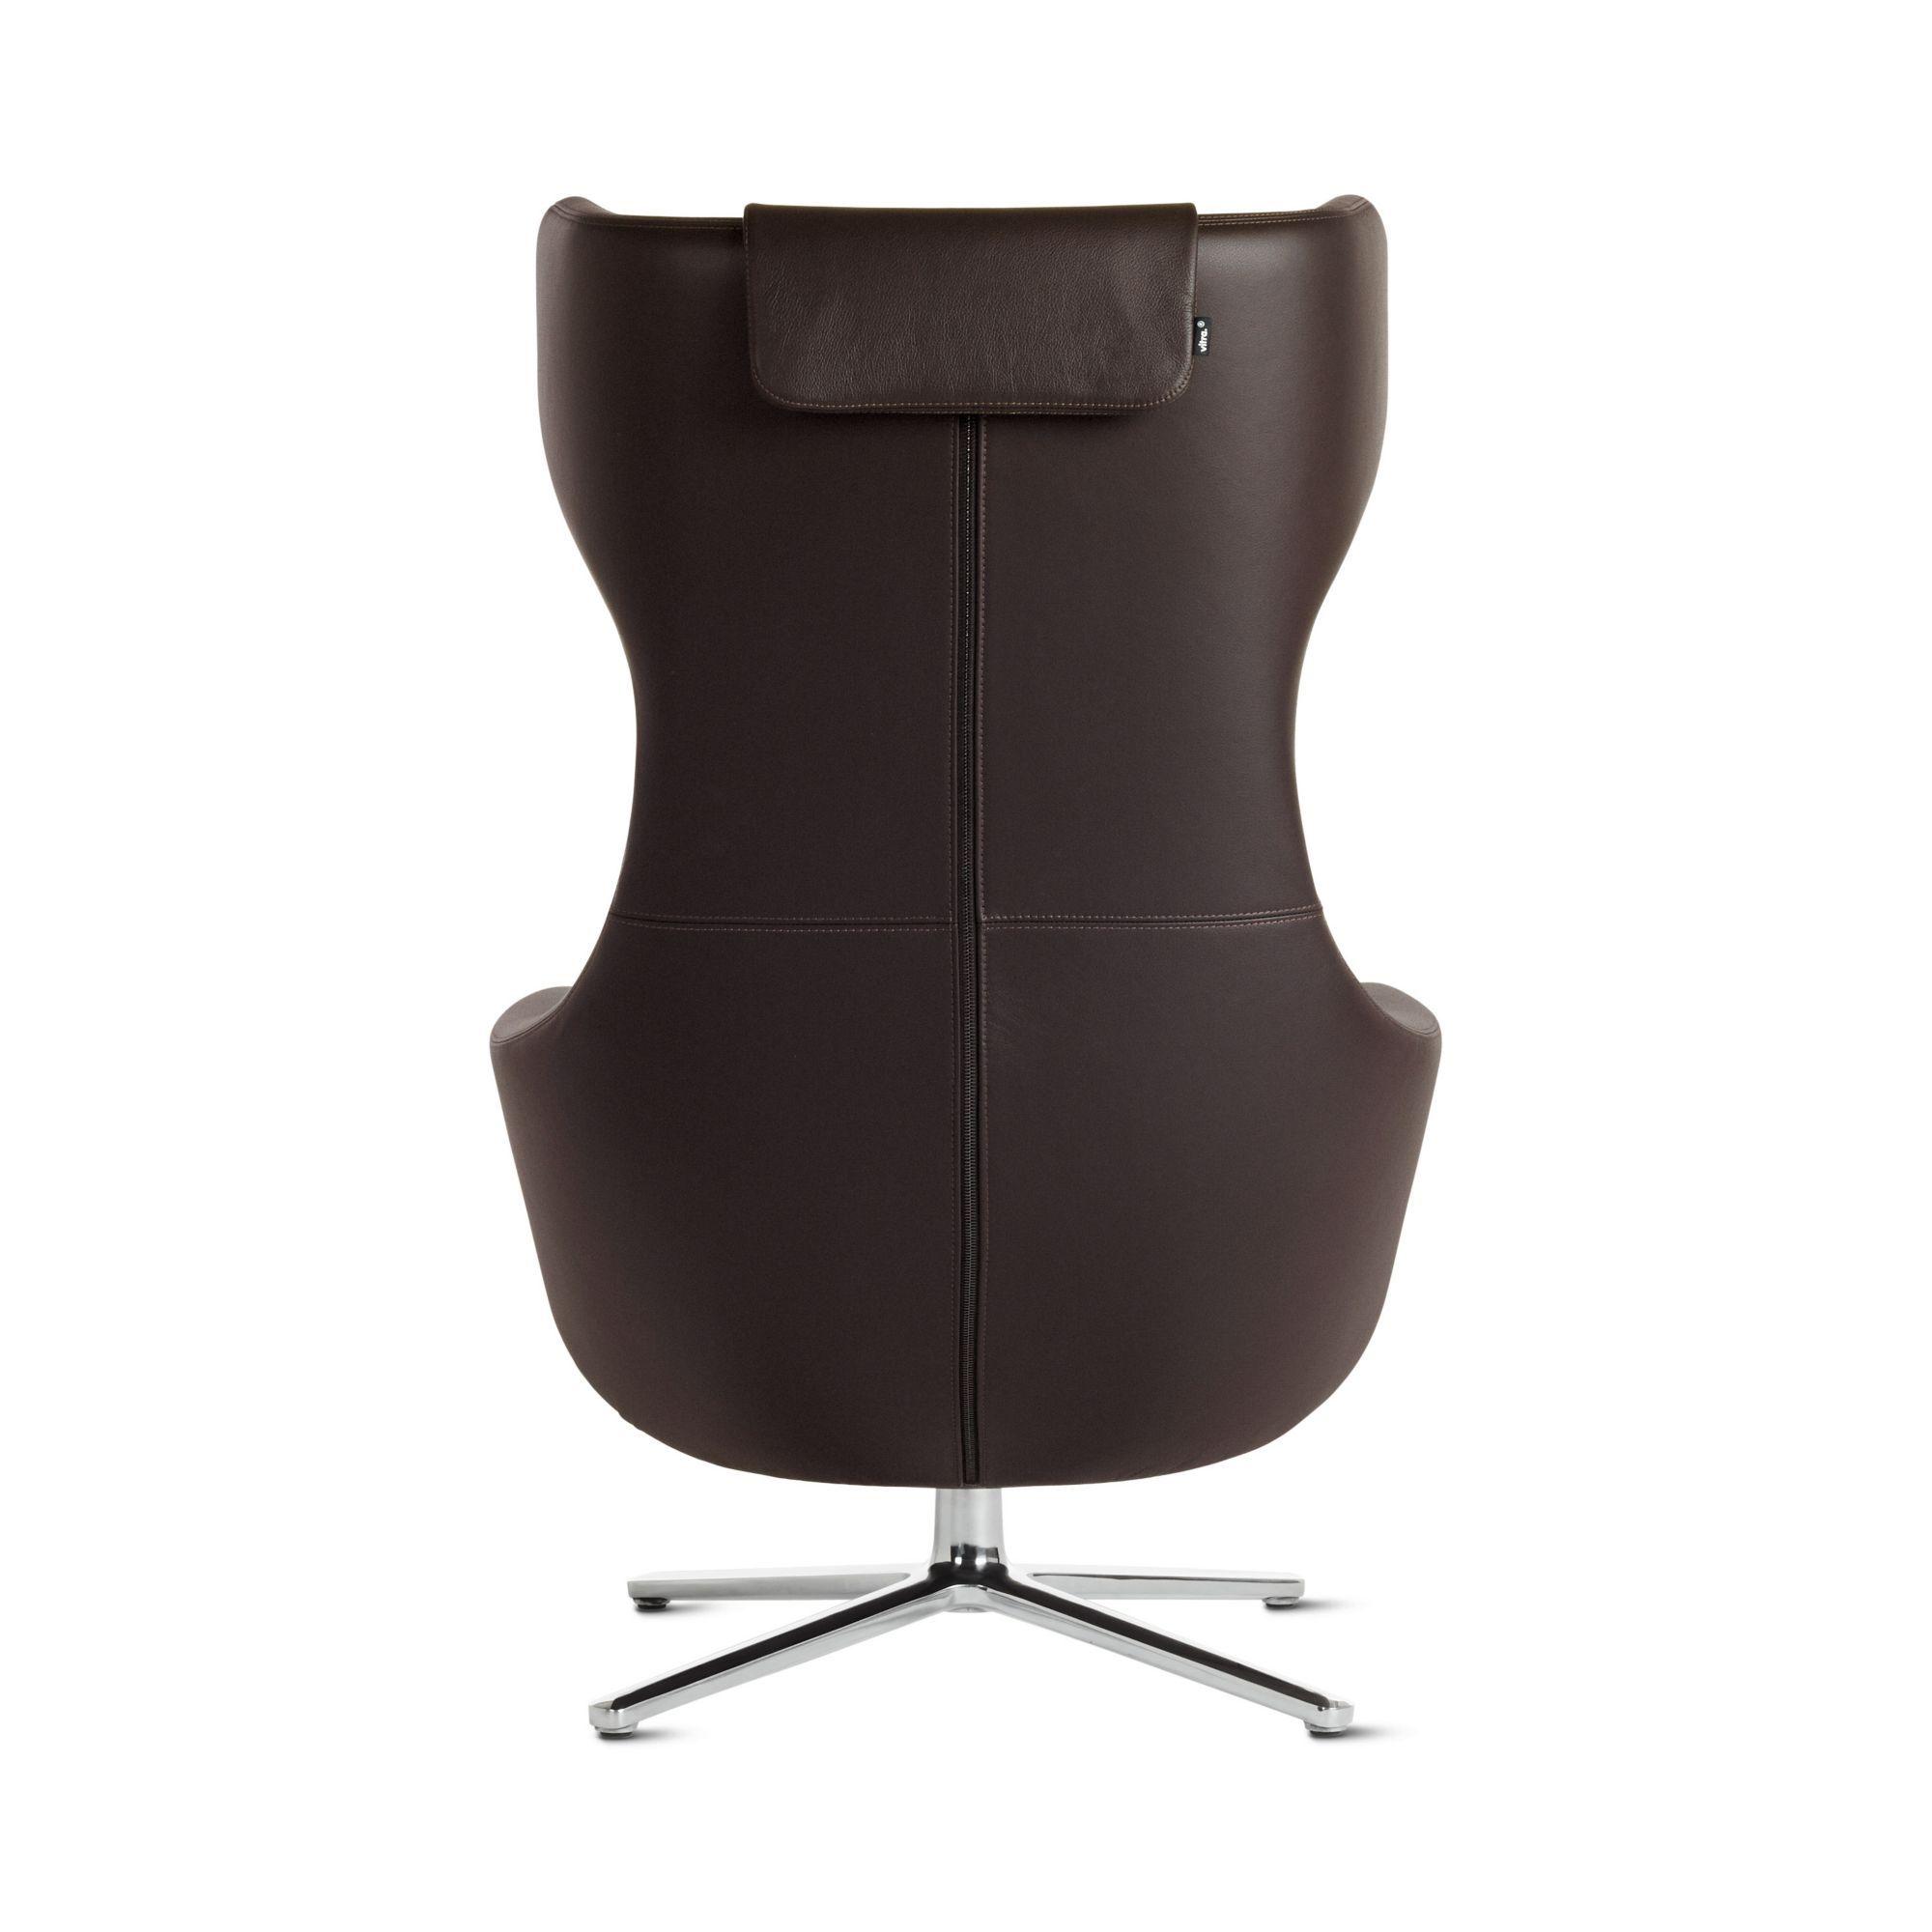 Poltrona Grand Repos Vitra.Grand Repos Lounge Chair And Ottoman